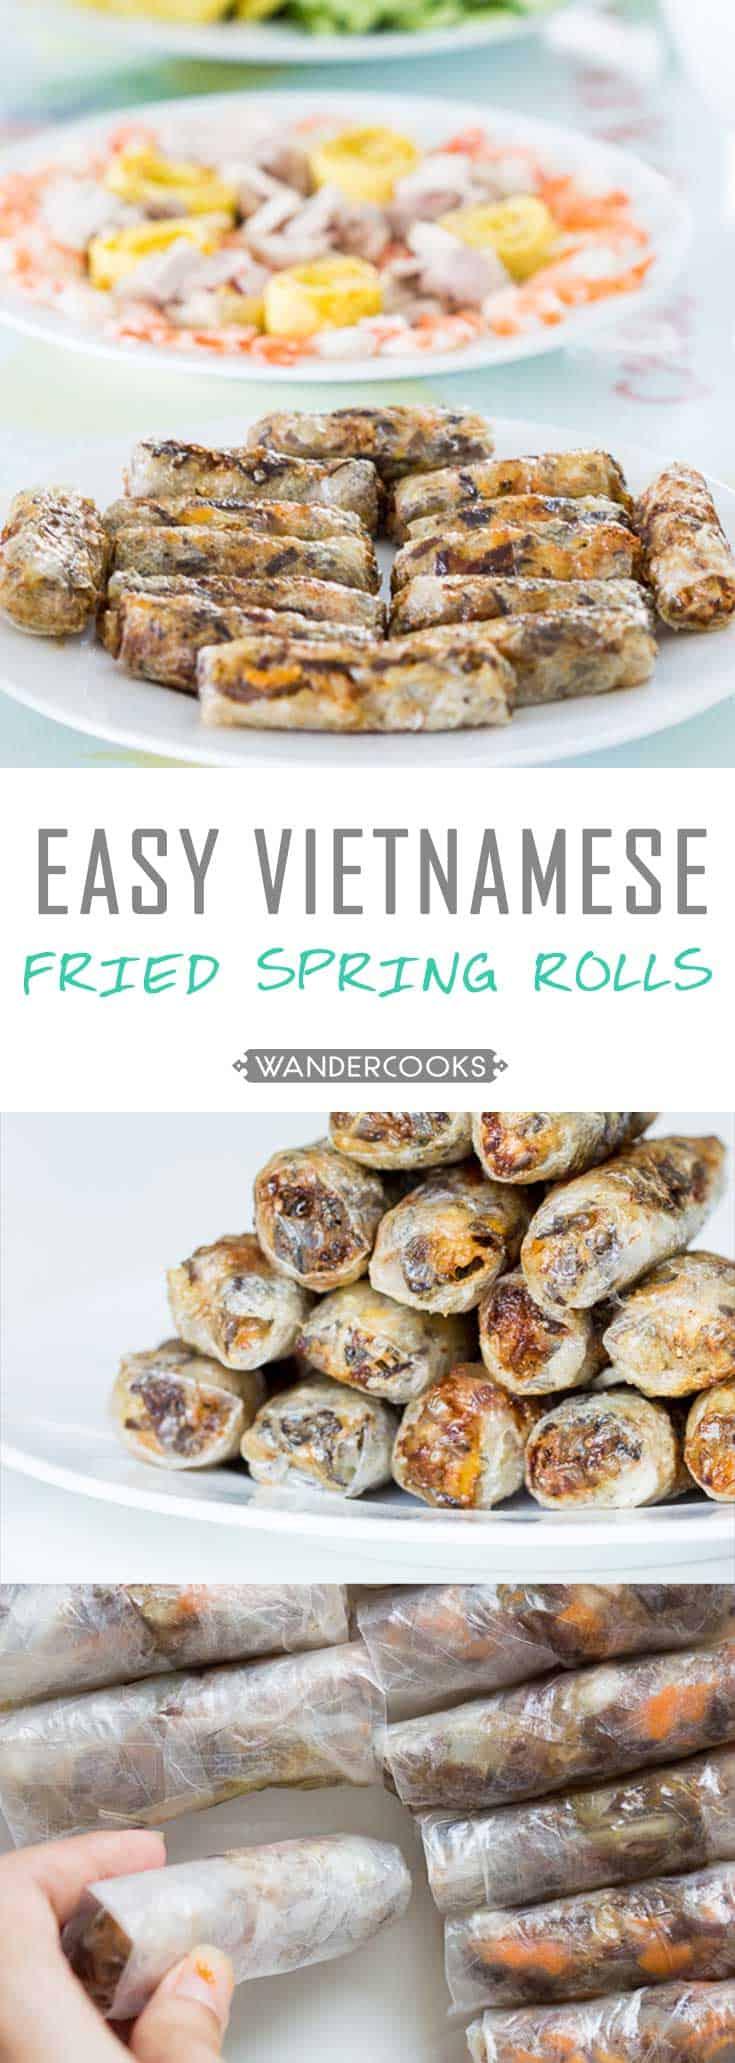 beef spring roll recipe vietnamese Vietnamese Fried Spring Rolls Recipe